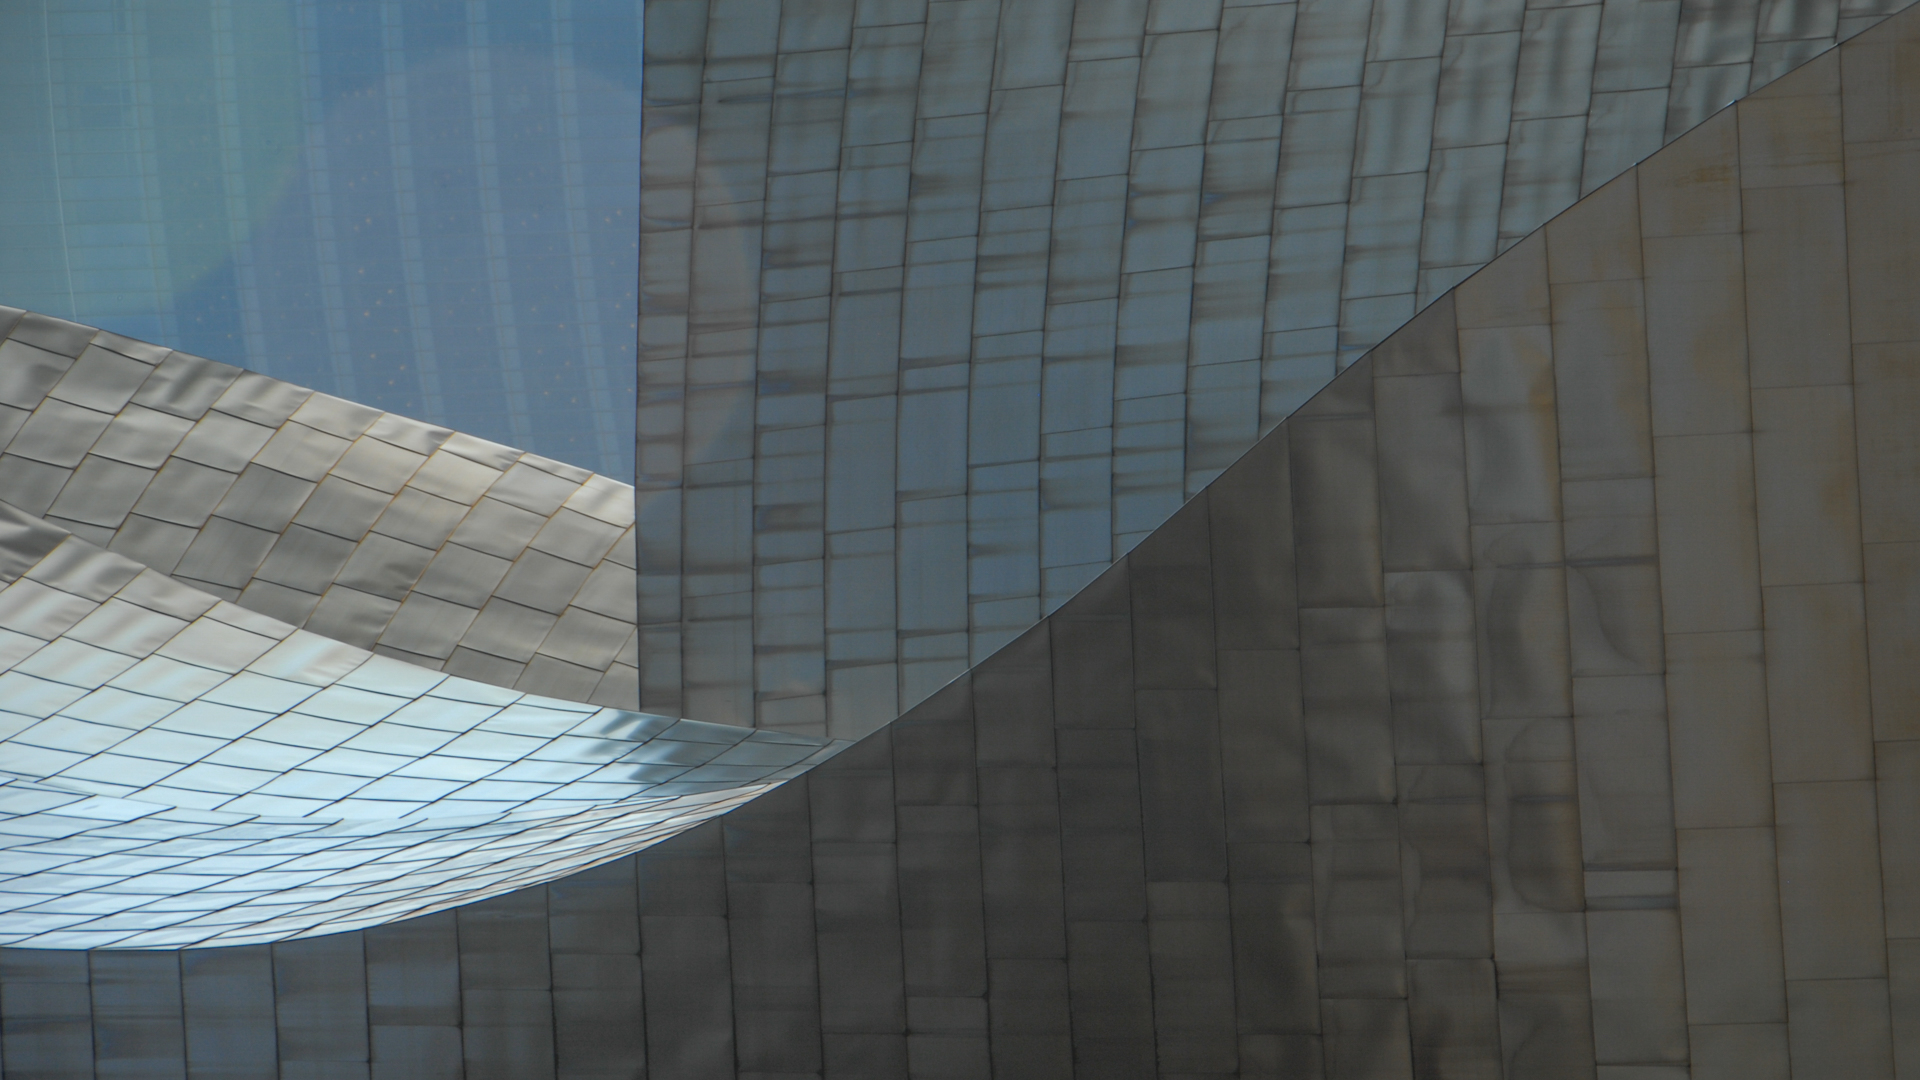 Bilbao Guggenheim - exterior